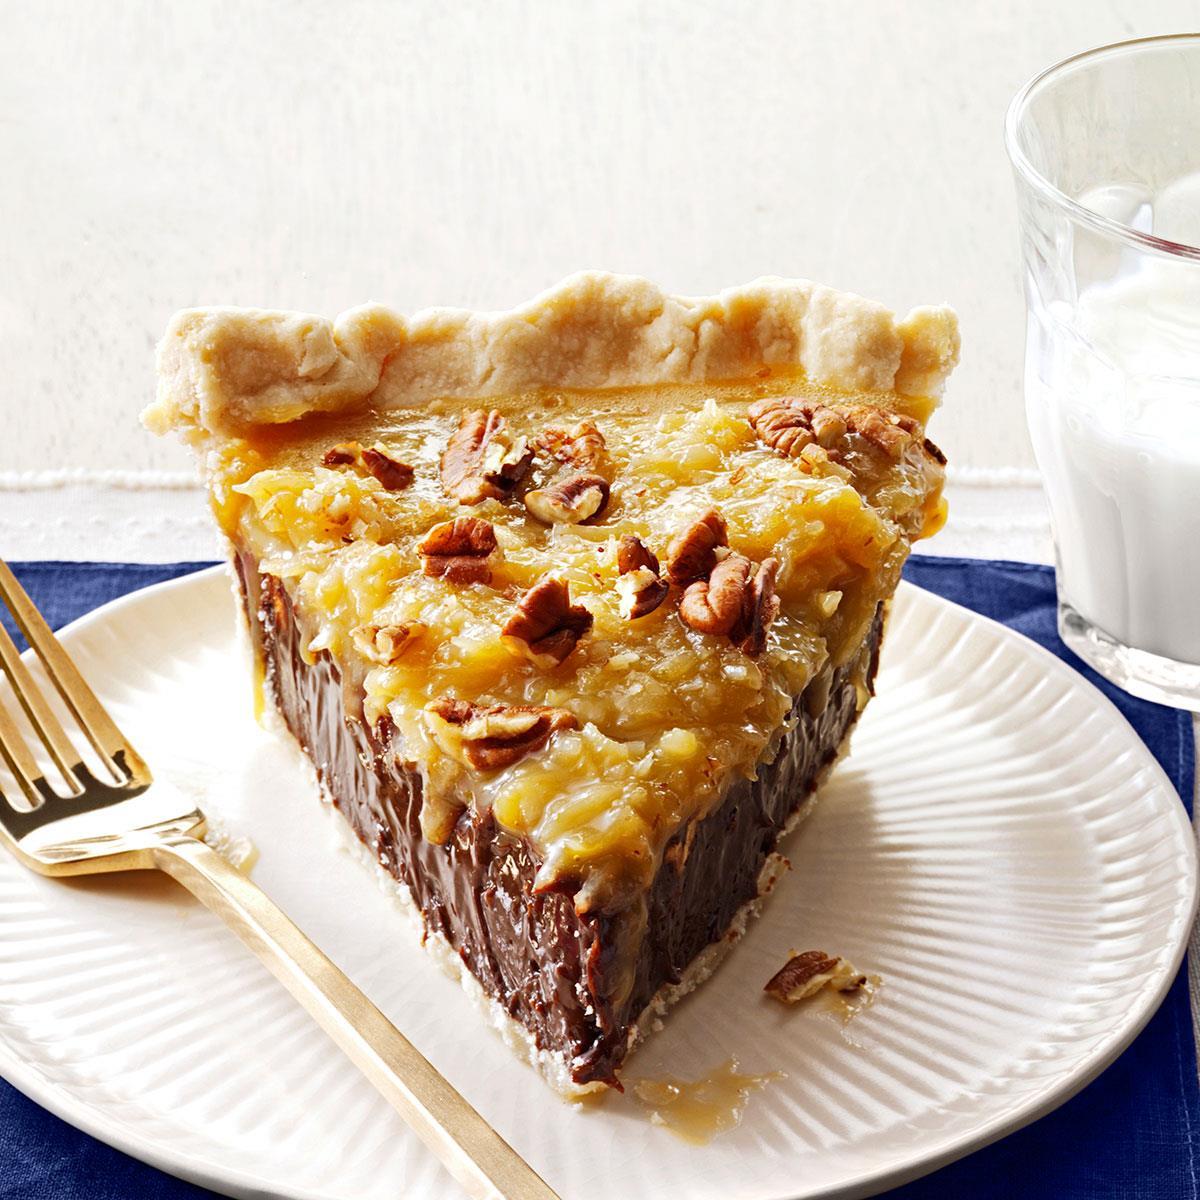 coconut-pecan german chocolate pie recipe | taste of home